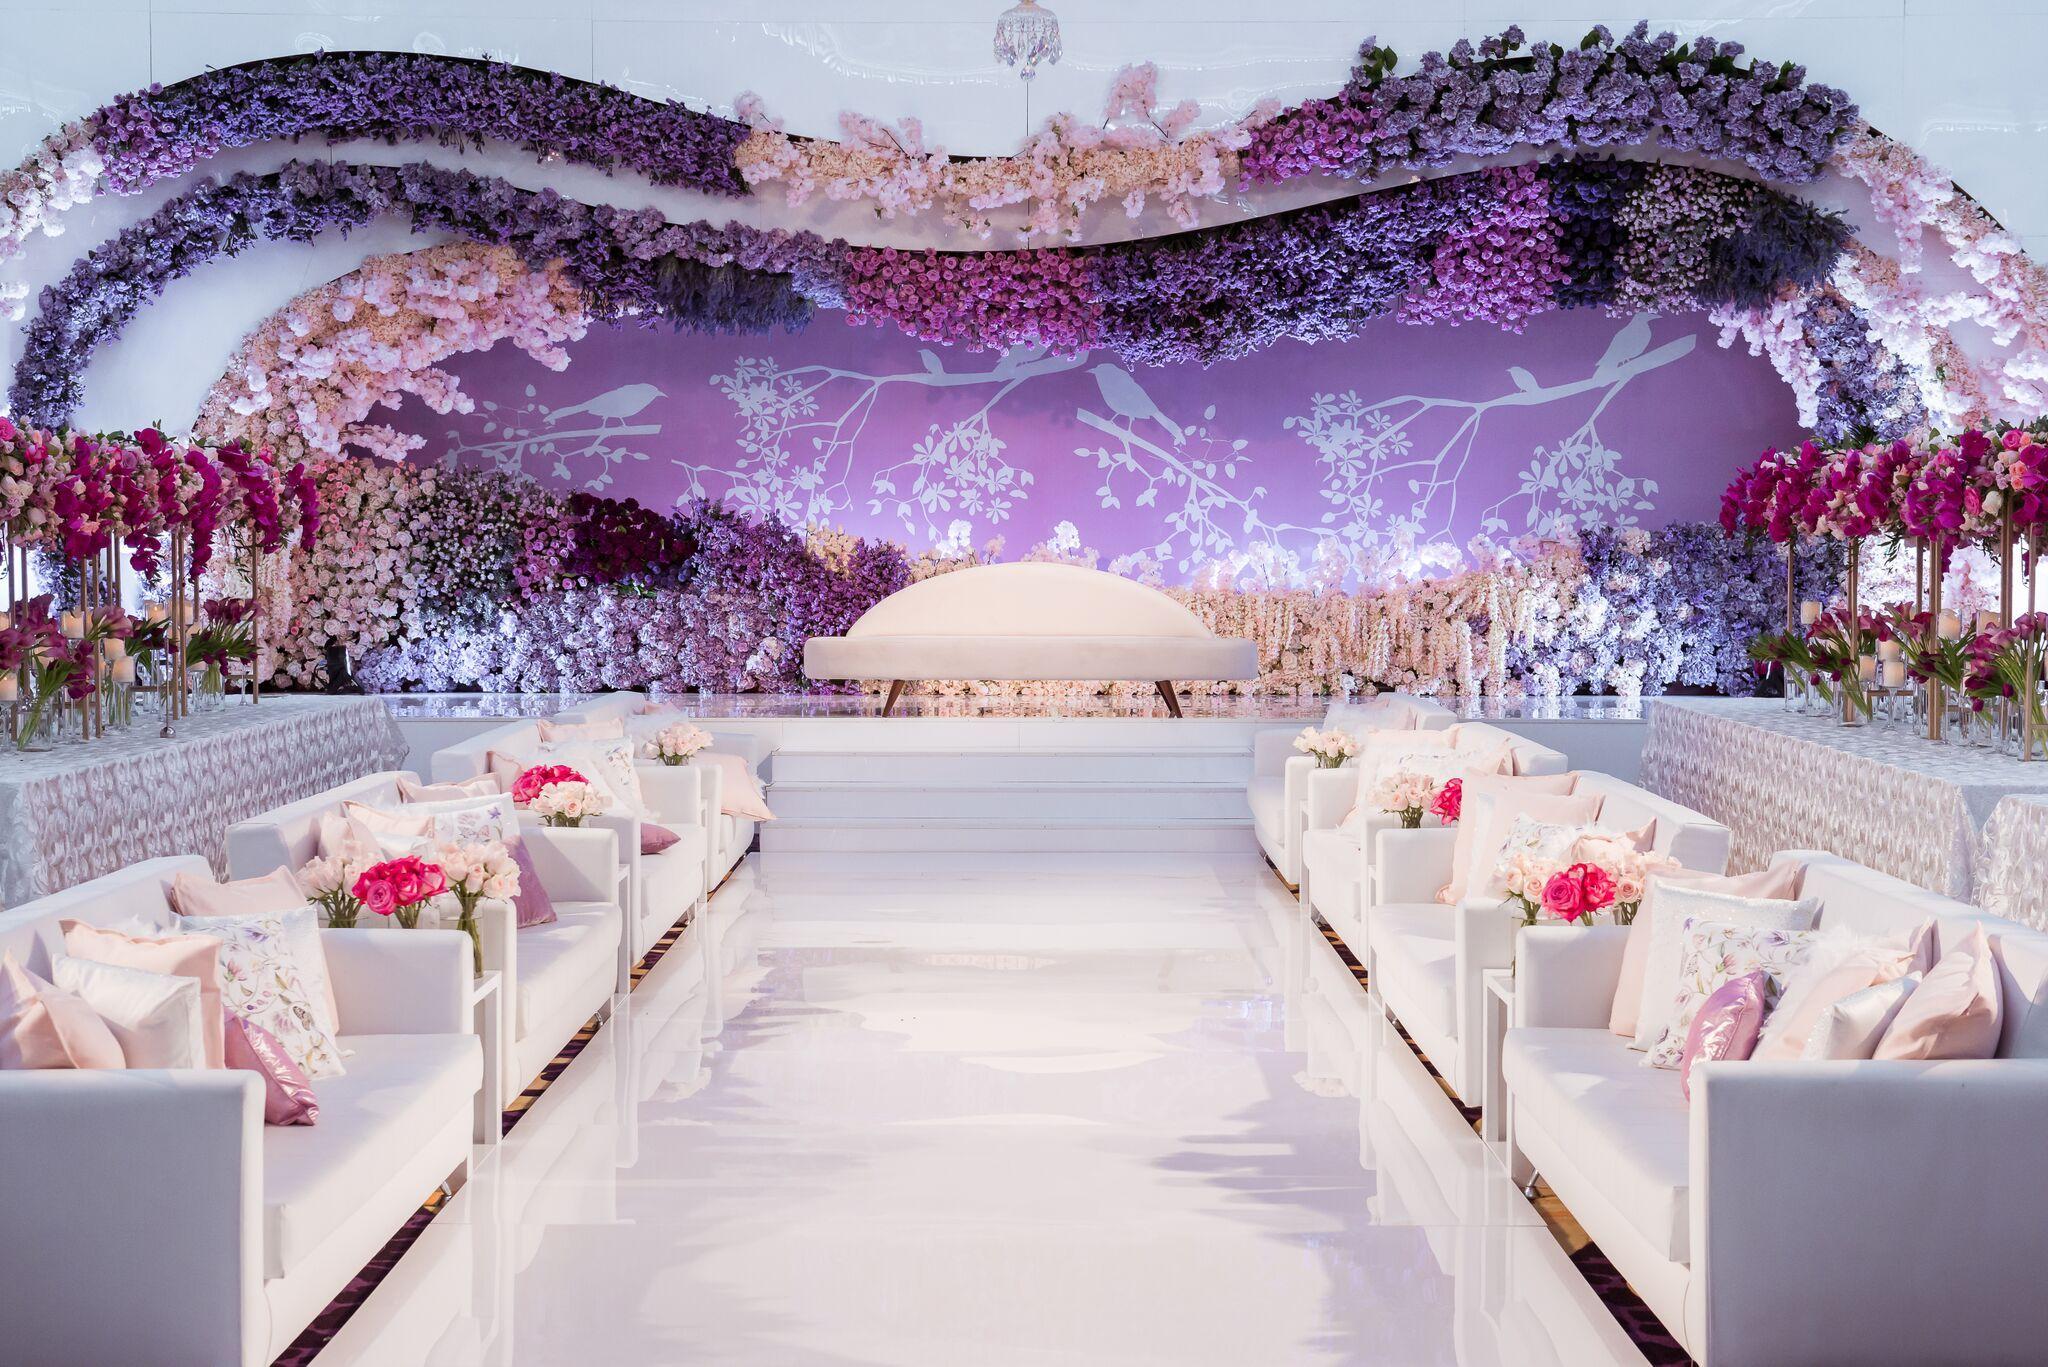 Stage Set Up For A Wedding Ceremony Palazzoversacedubai Inspiringluxury Event Wedding Banquet Versace Versace Home Palazzo Versace Wedding Decorations